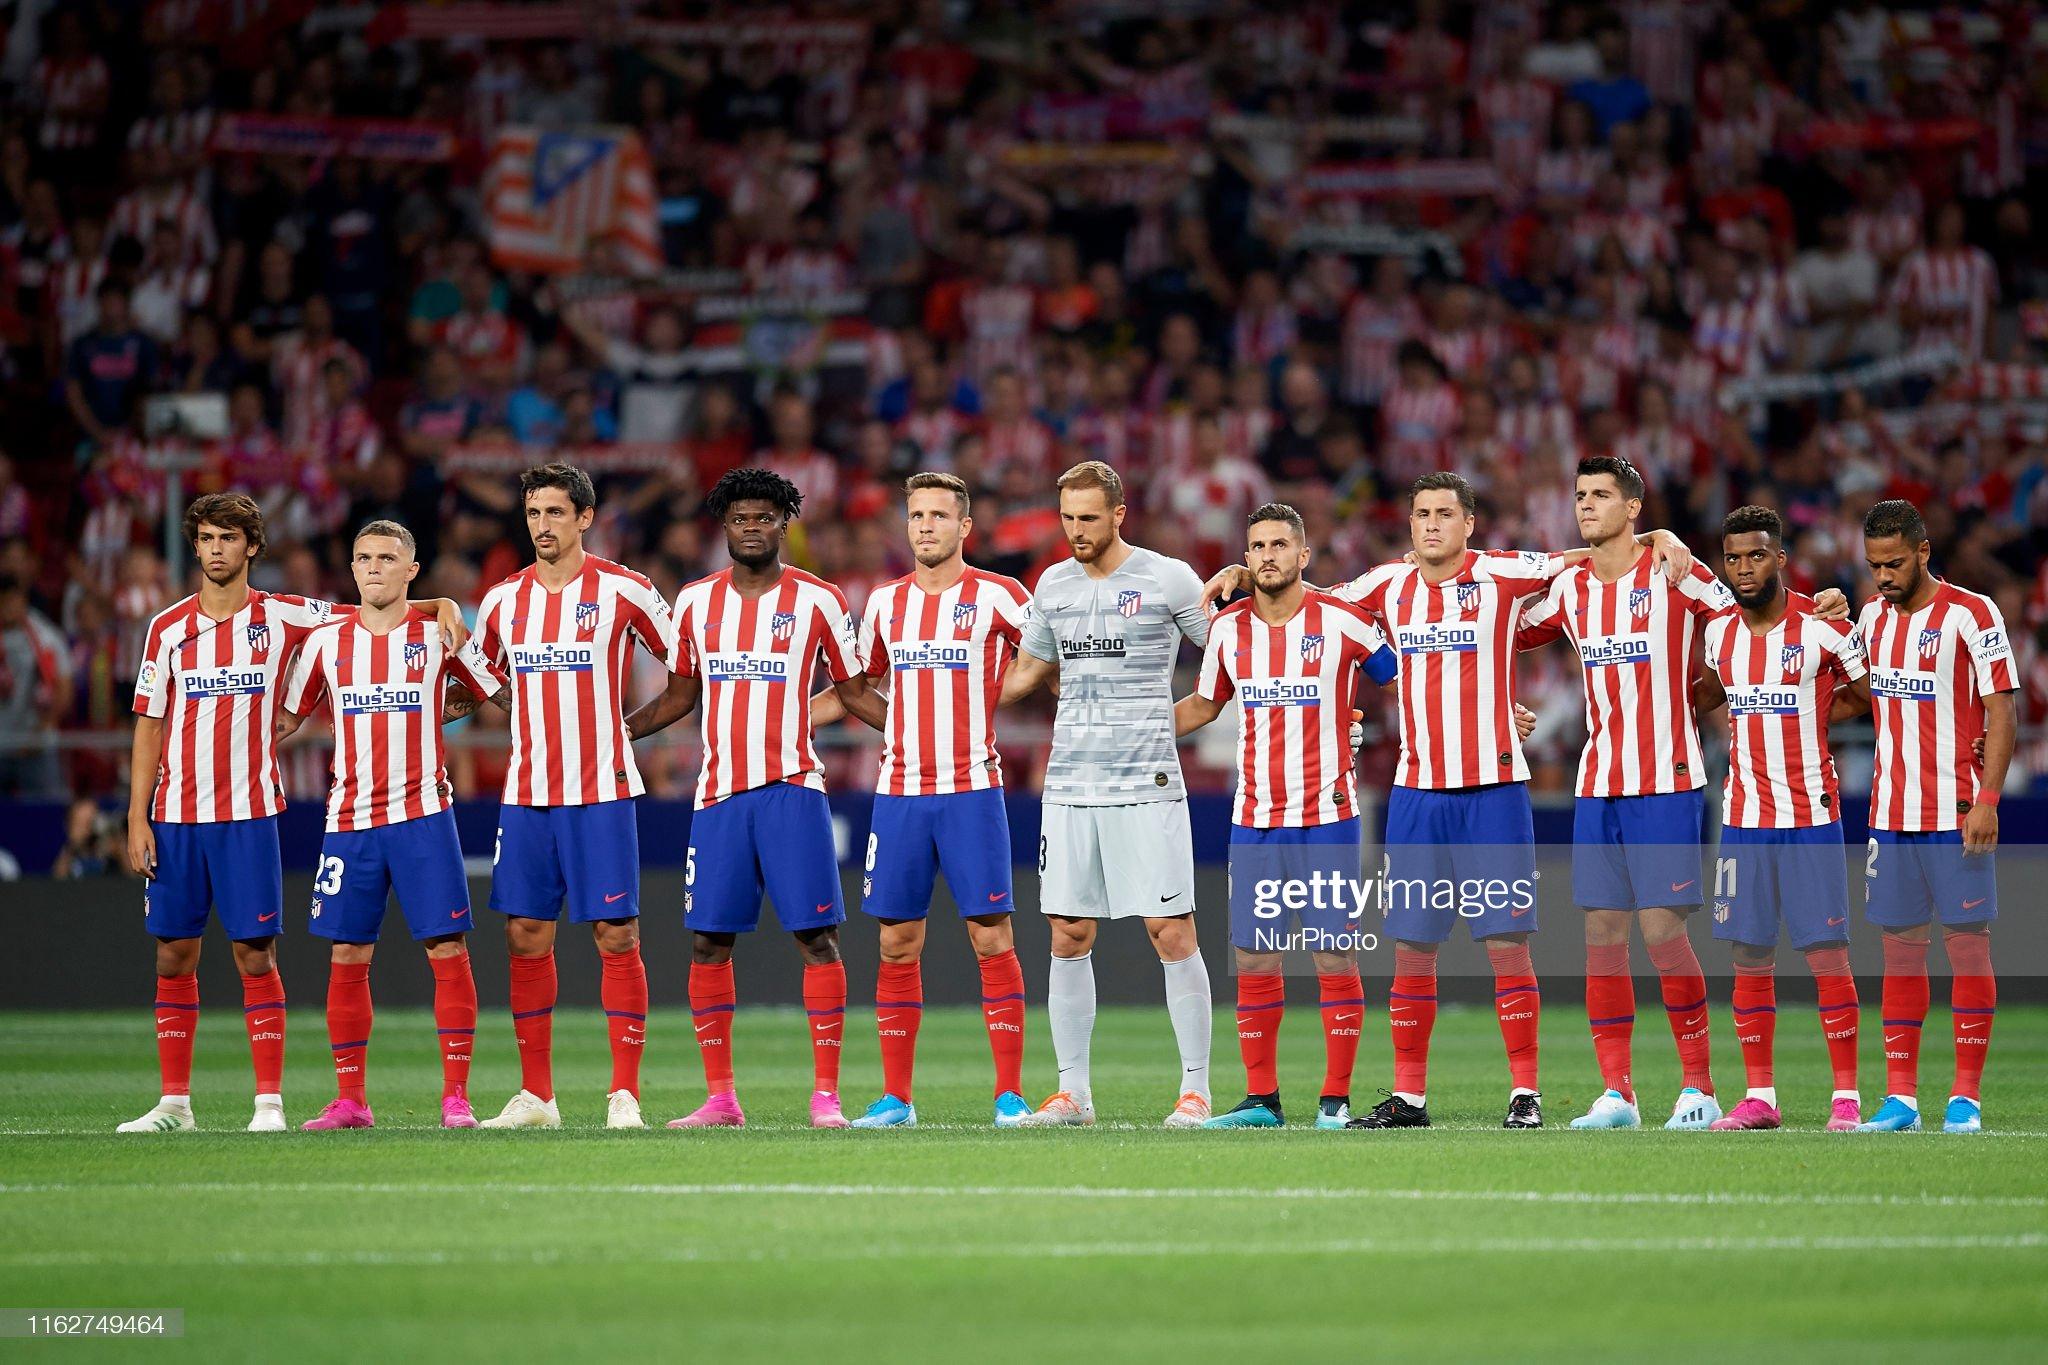 Hilo del Atlético de Madrid Joao-felix-kieran-trippier-stefan-savicthomas-saul-niguez-jan-oblak-picture-id1162749464?s=2048x2048